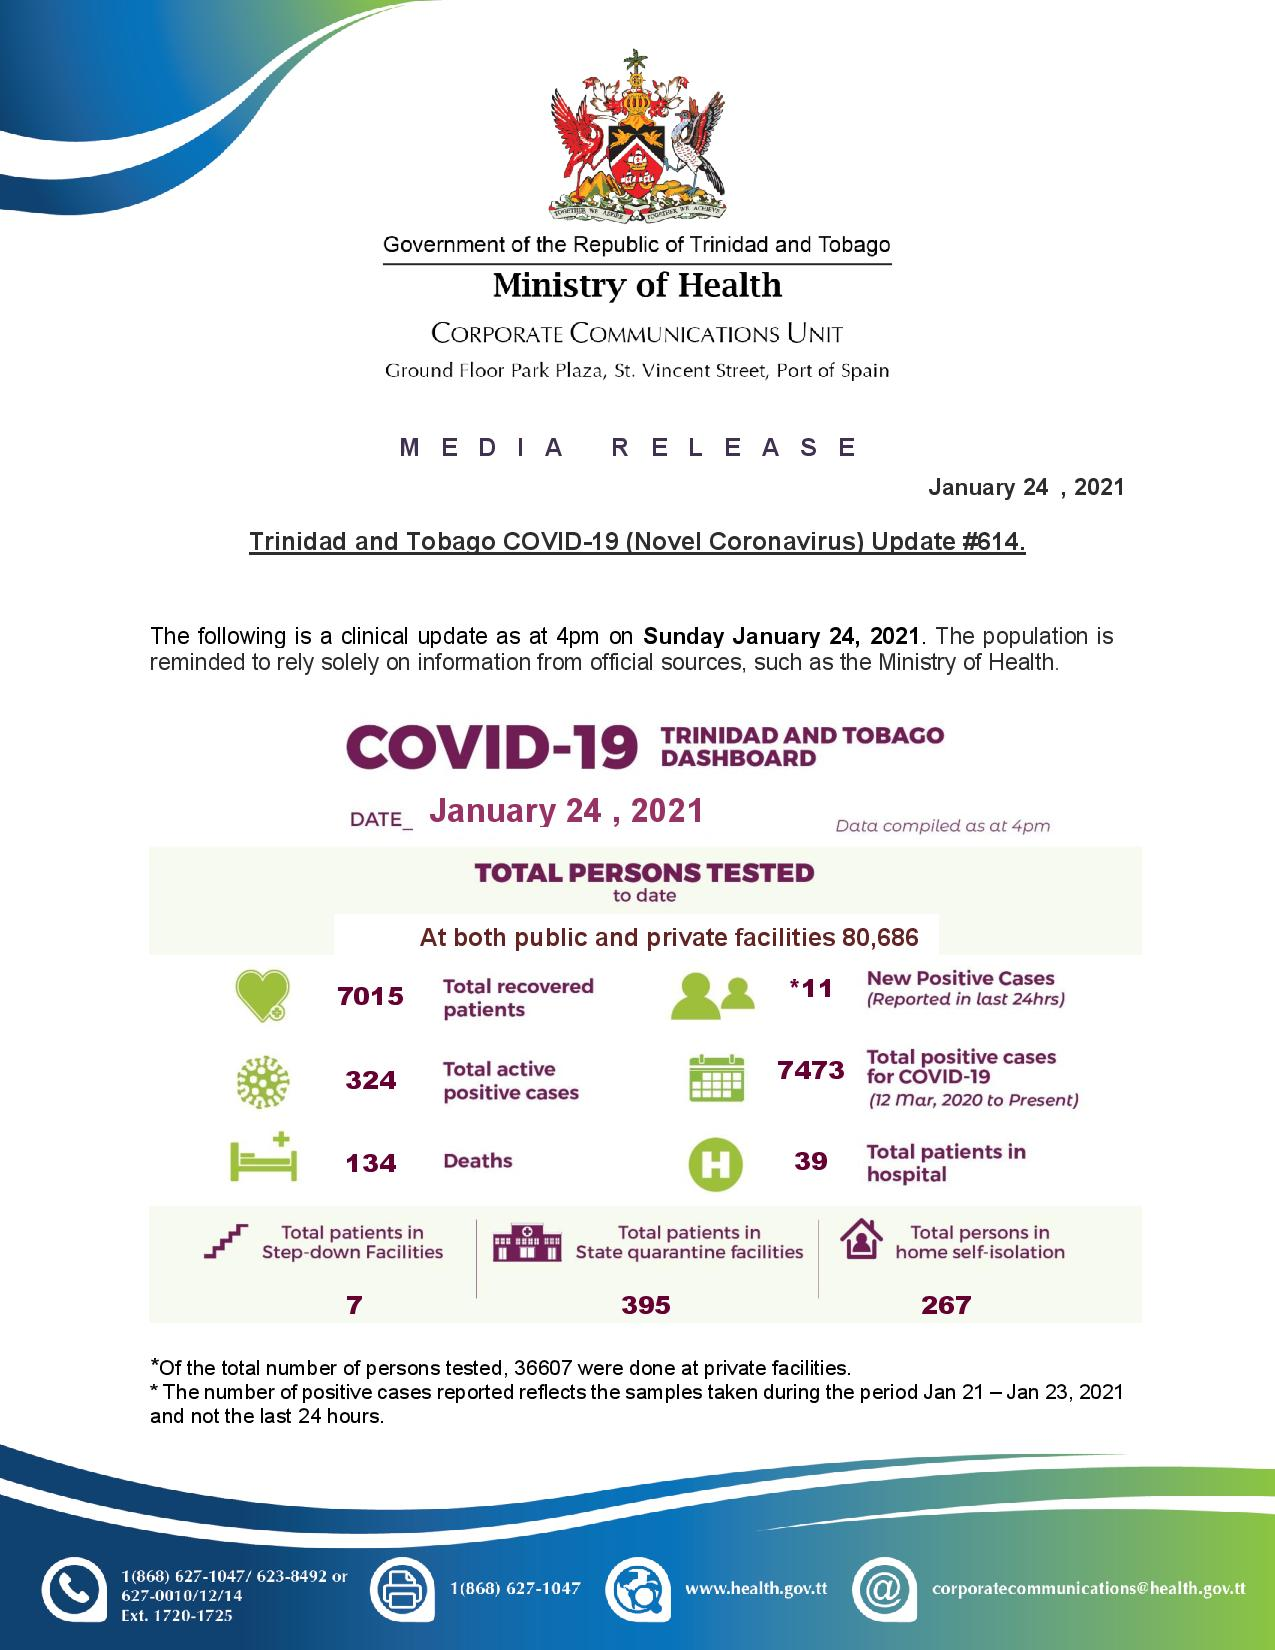 COVID-19 UPDATE - Sunday 24th January 2021 Dashboard